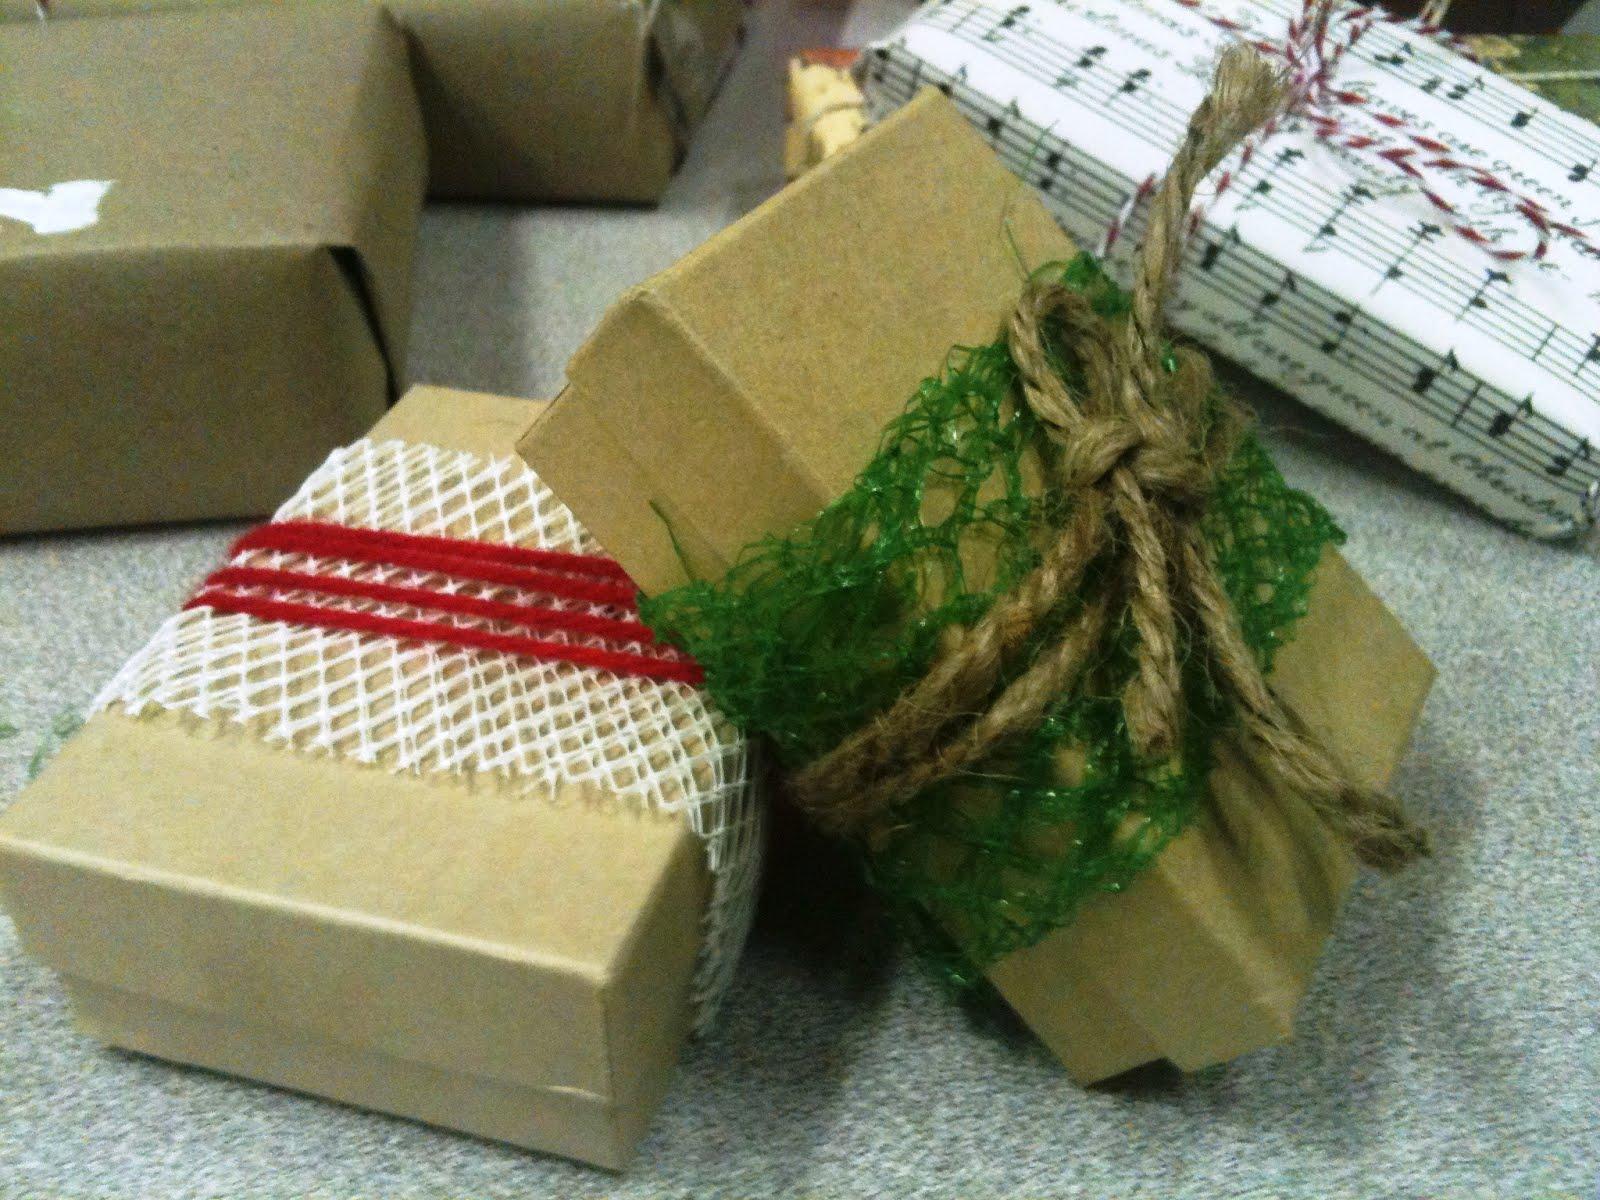 Ecomania blog envoltorios de regalo creativos - Envoltorios para regalos ...